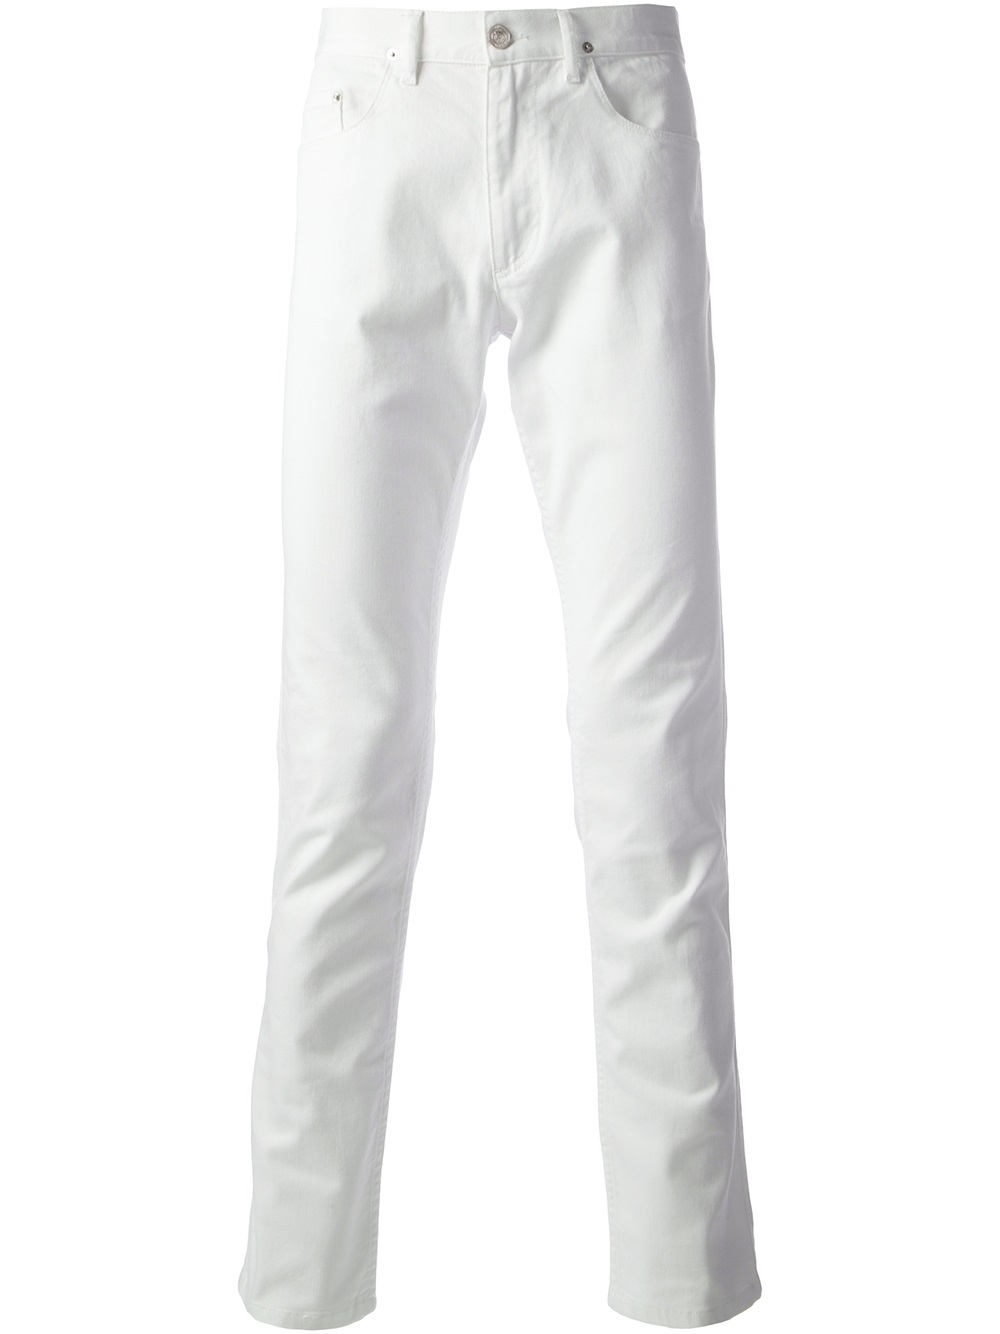 Kenzo Skinny Jeans in White for Men | Lyst